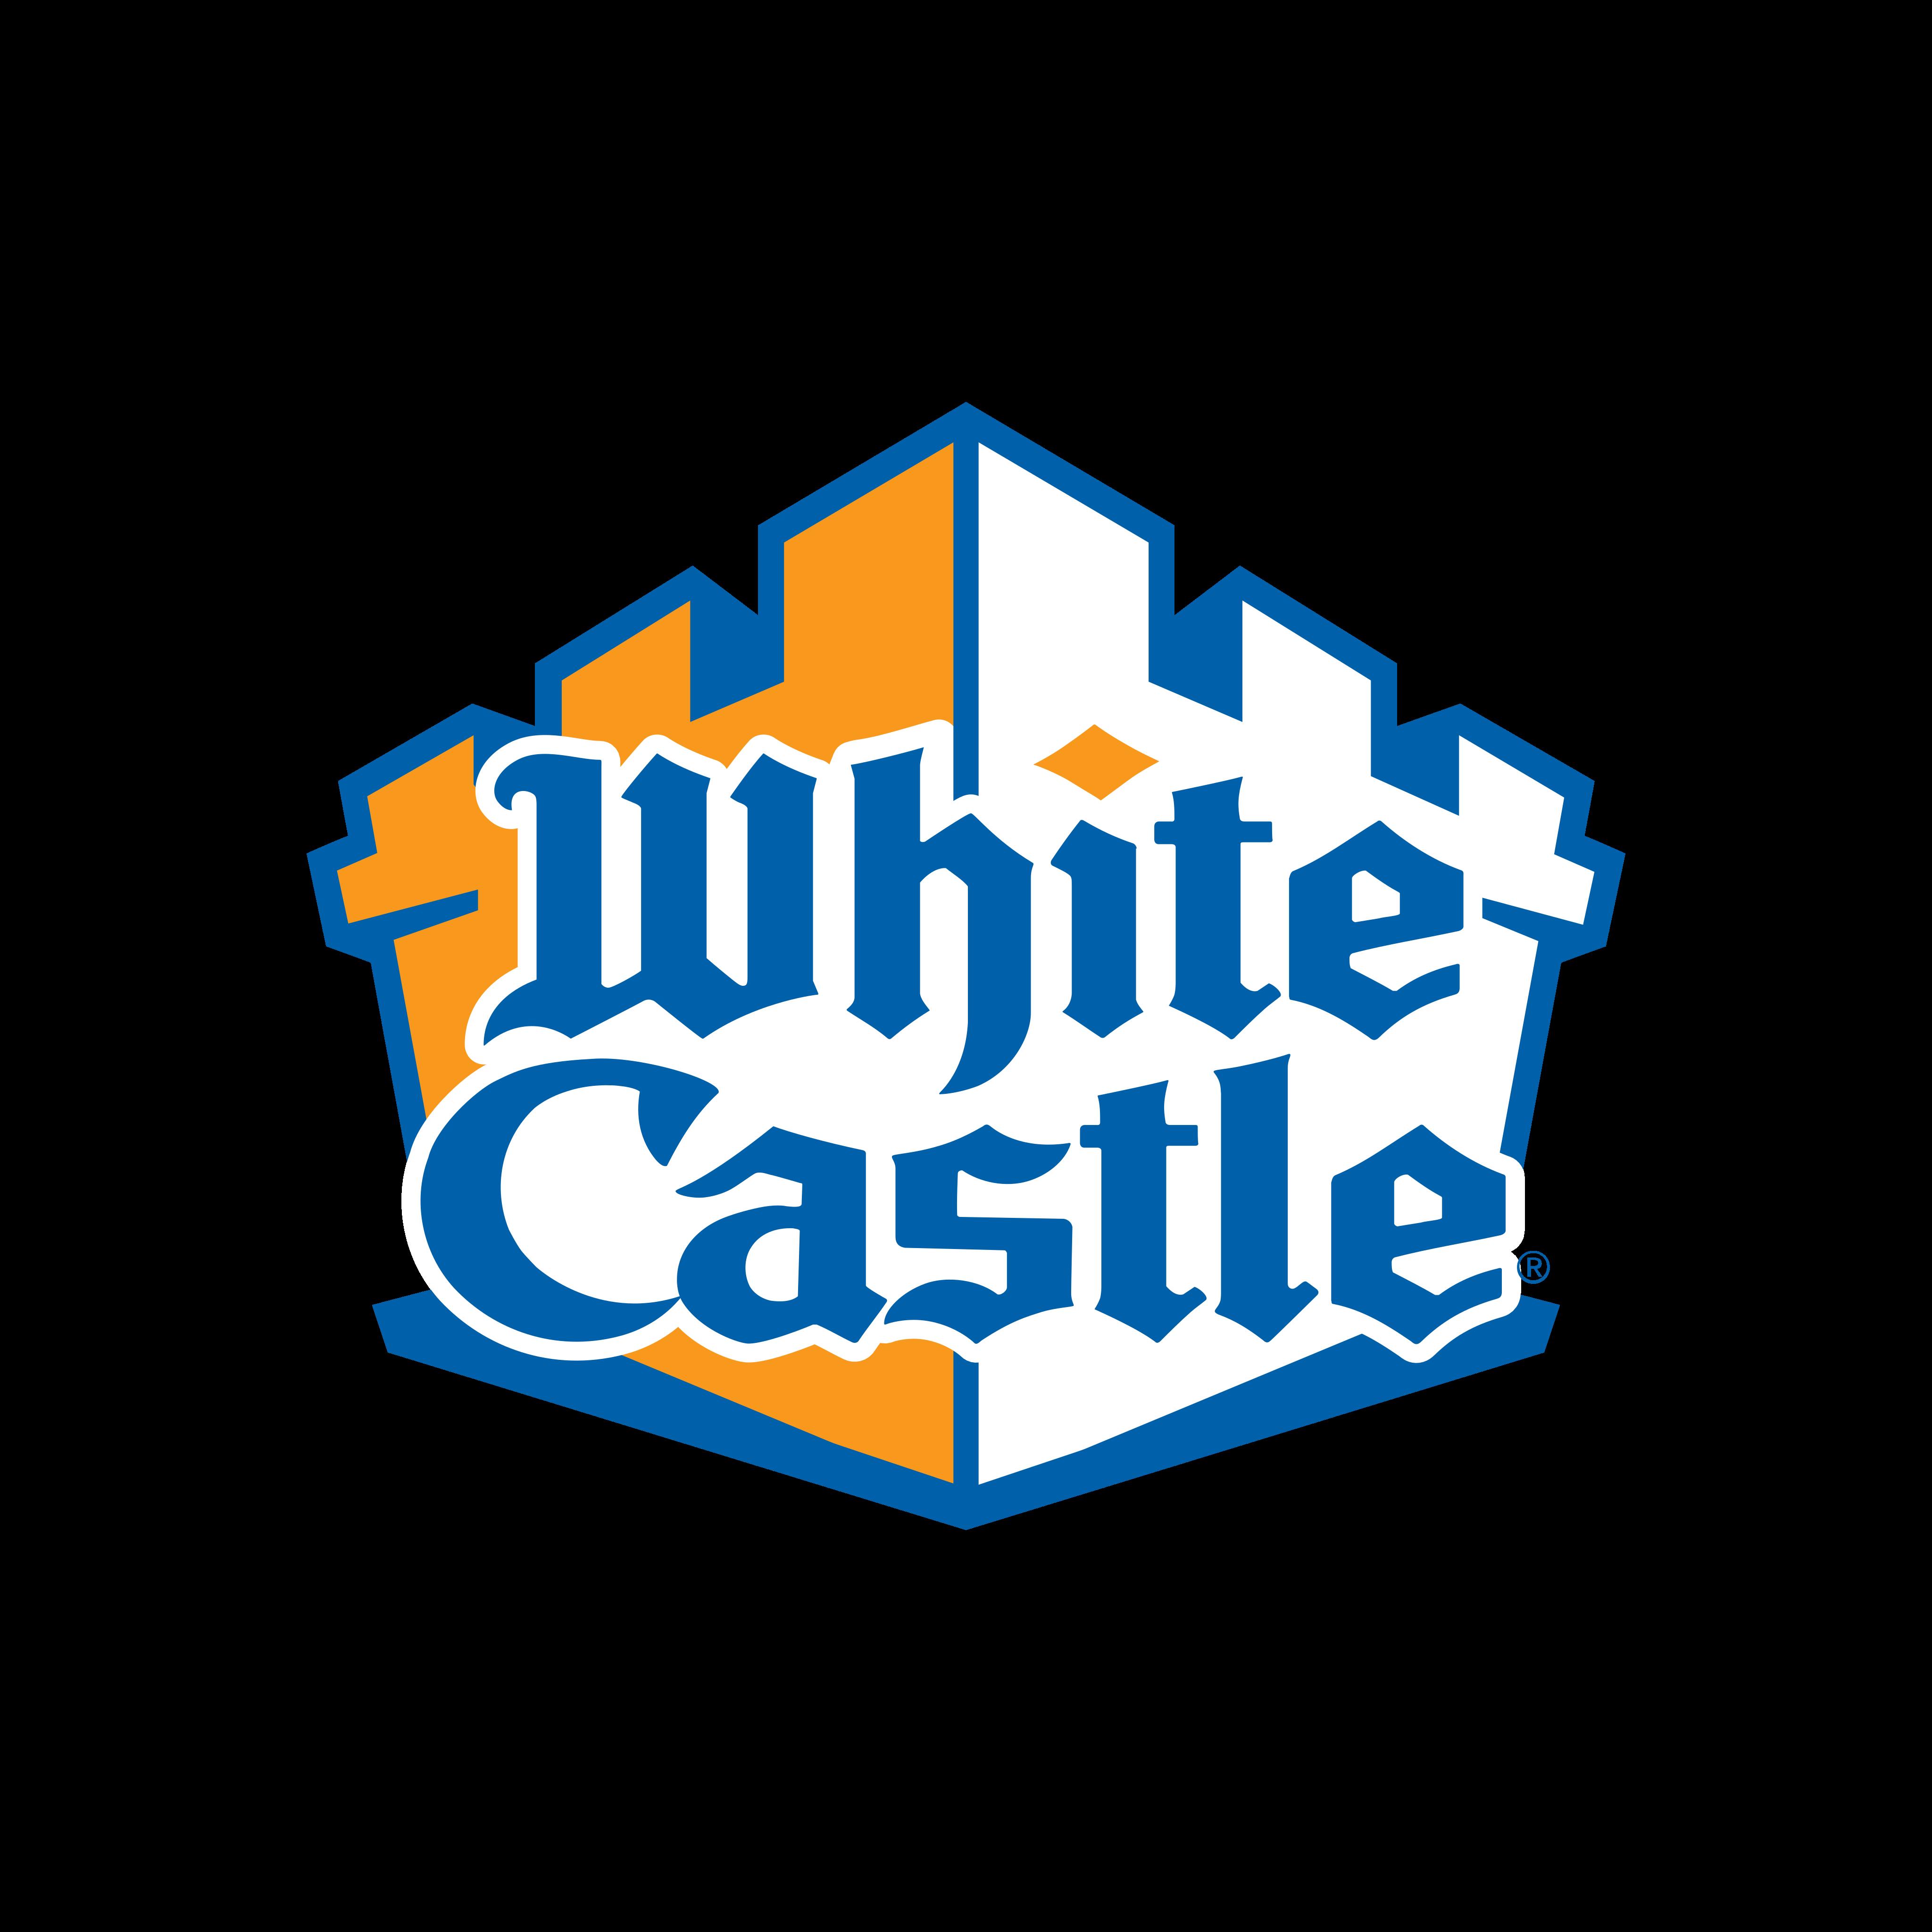 white castle logo 0 - White Castle Logo